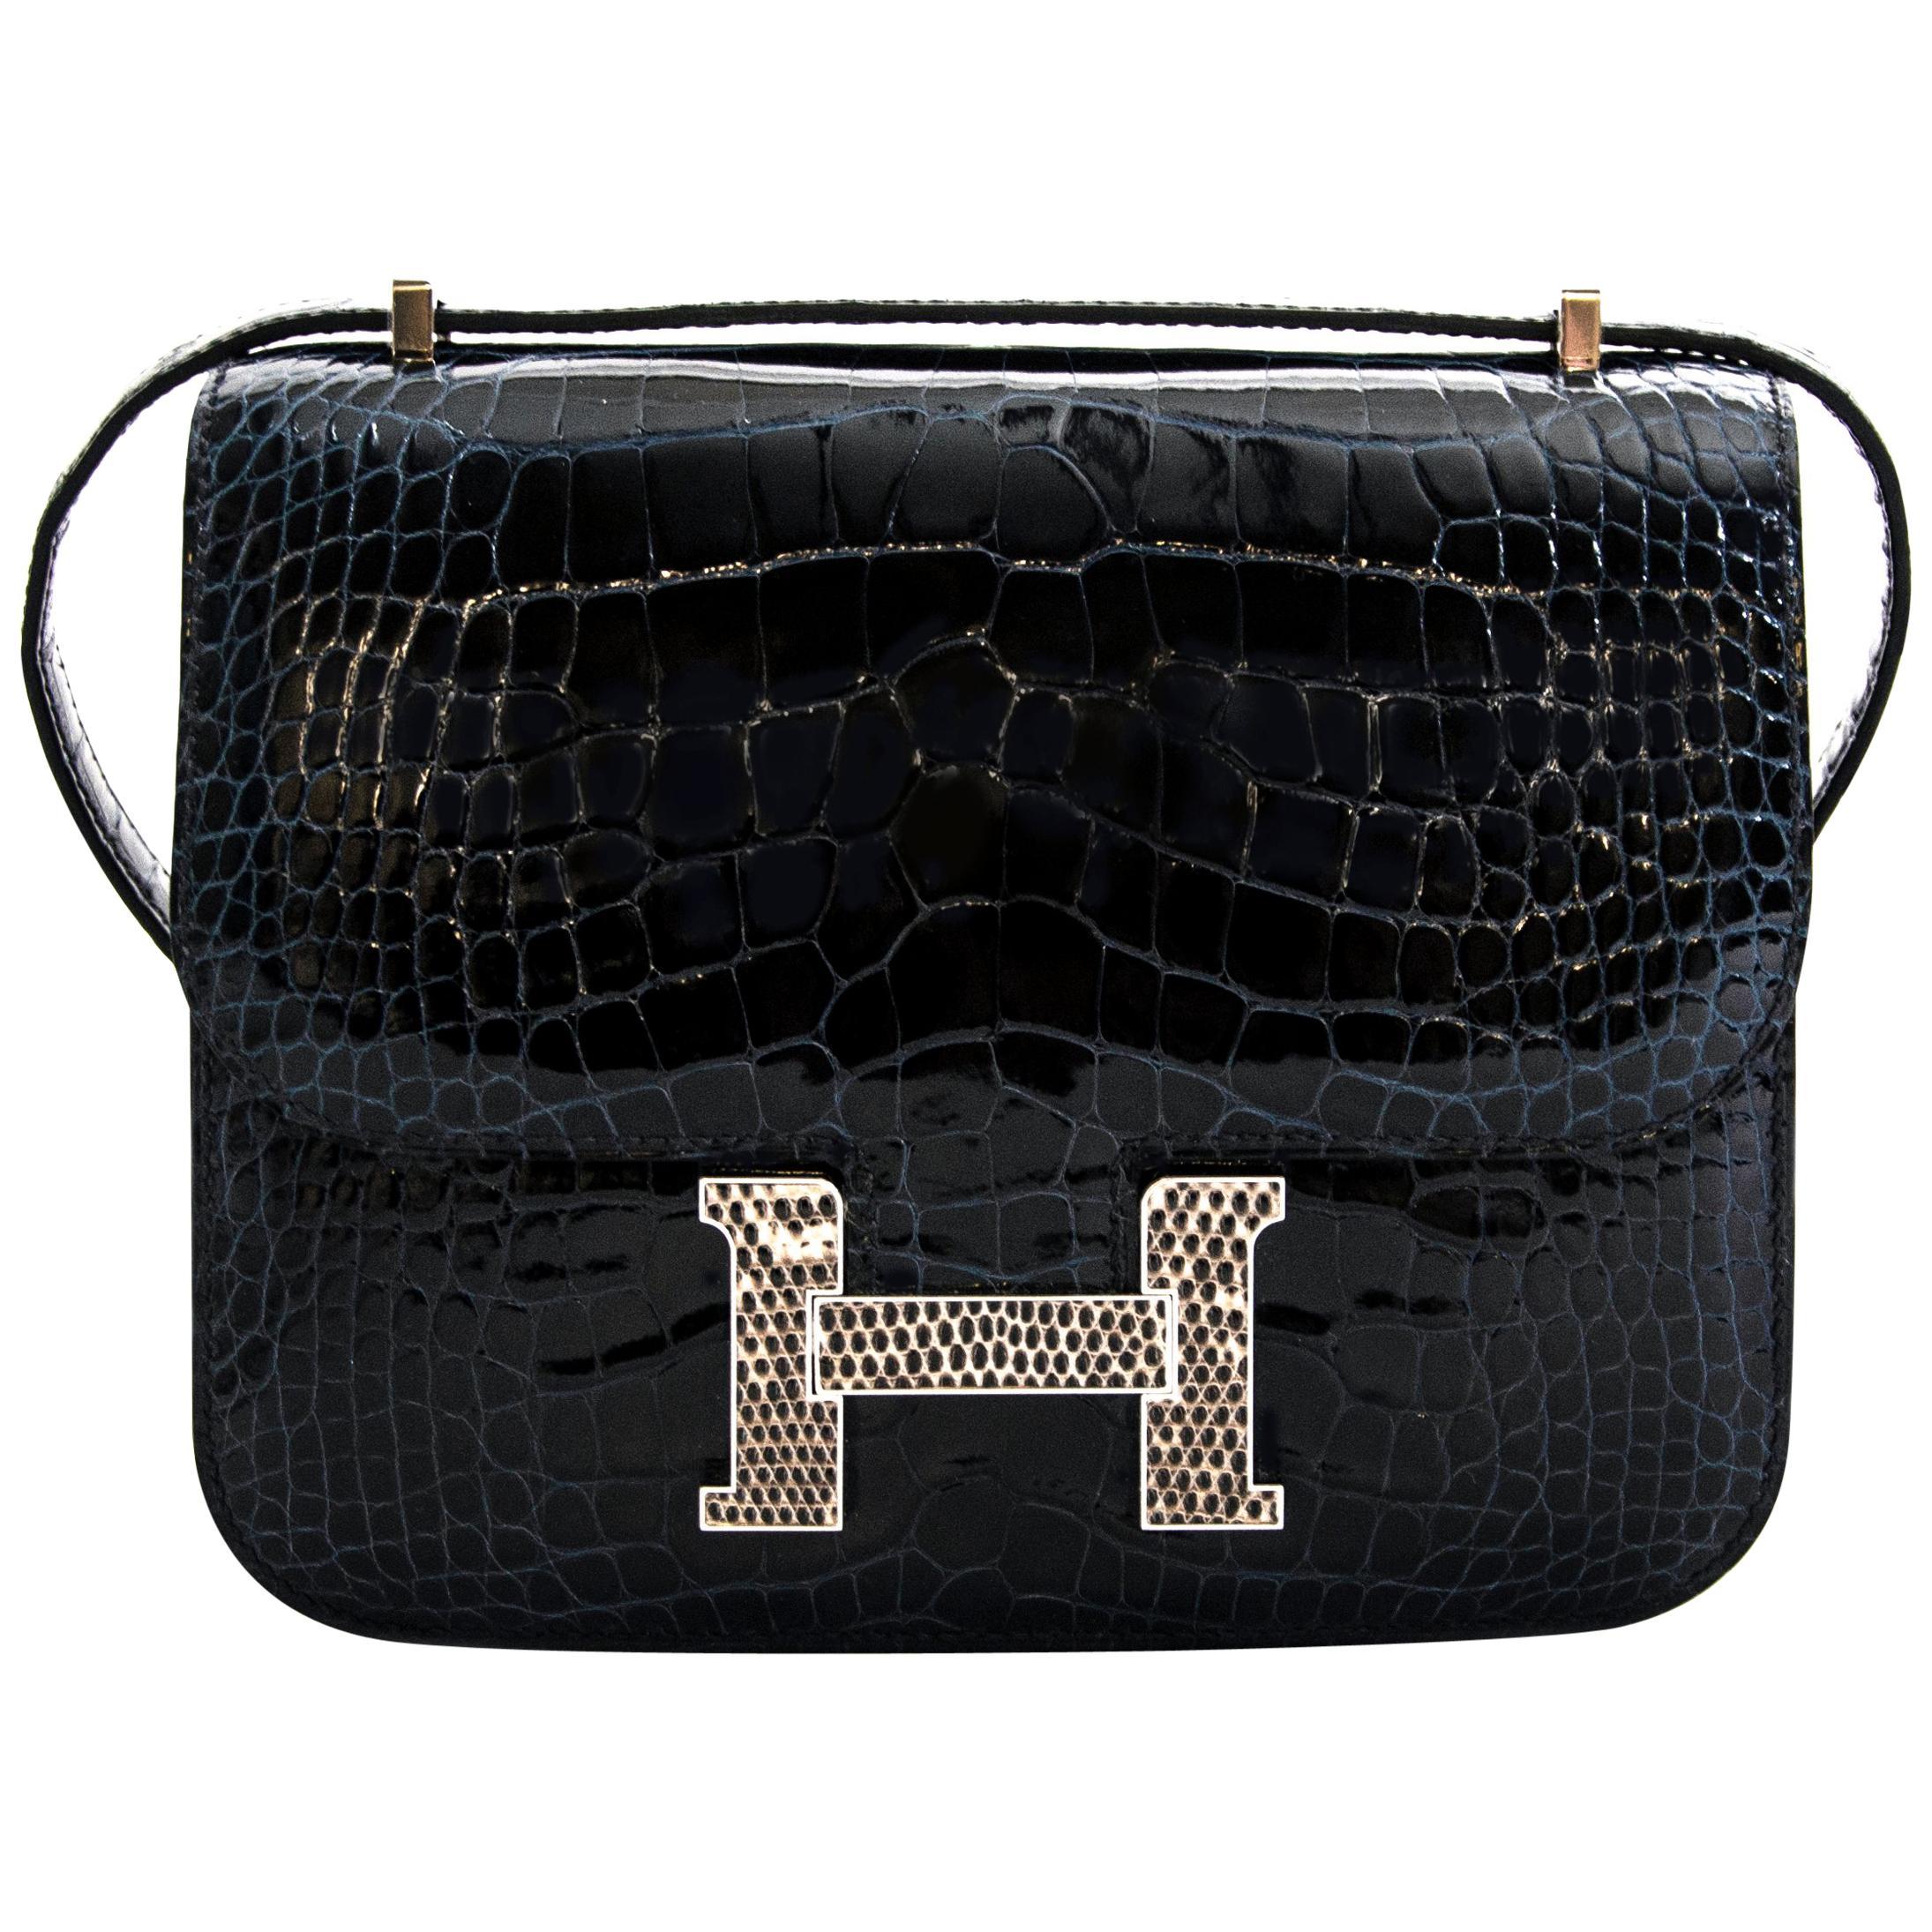 Hermès Constance Mini Marquete Alligator Miss. Lisse Bleu Marine / Ombre